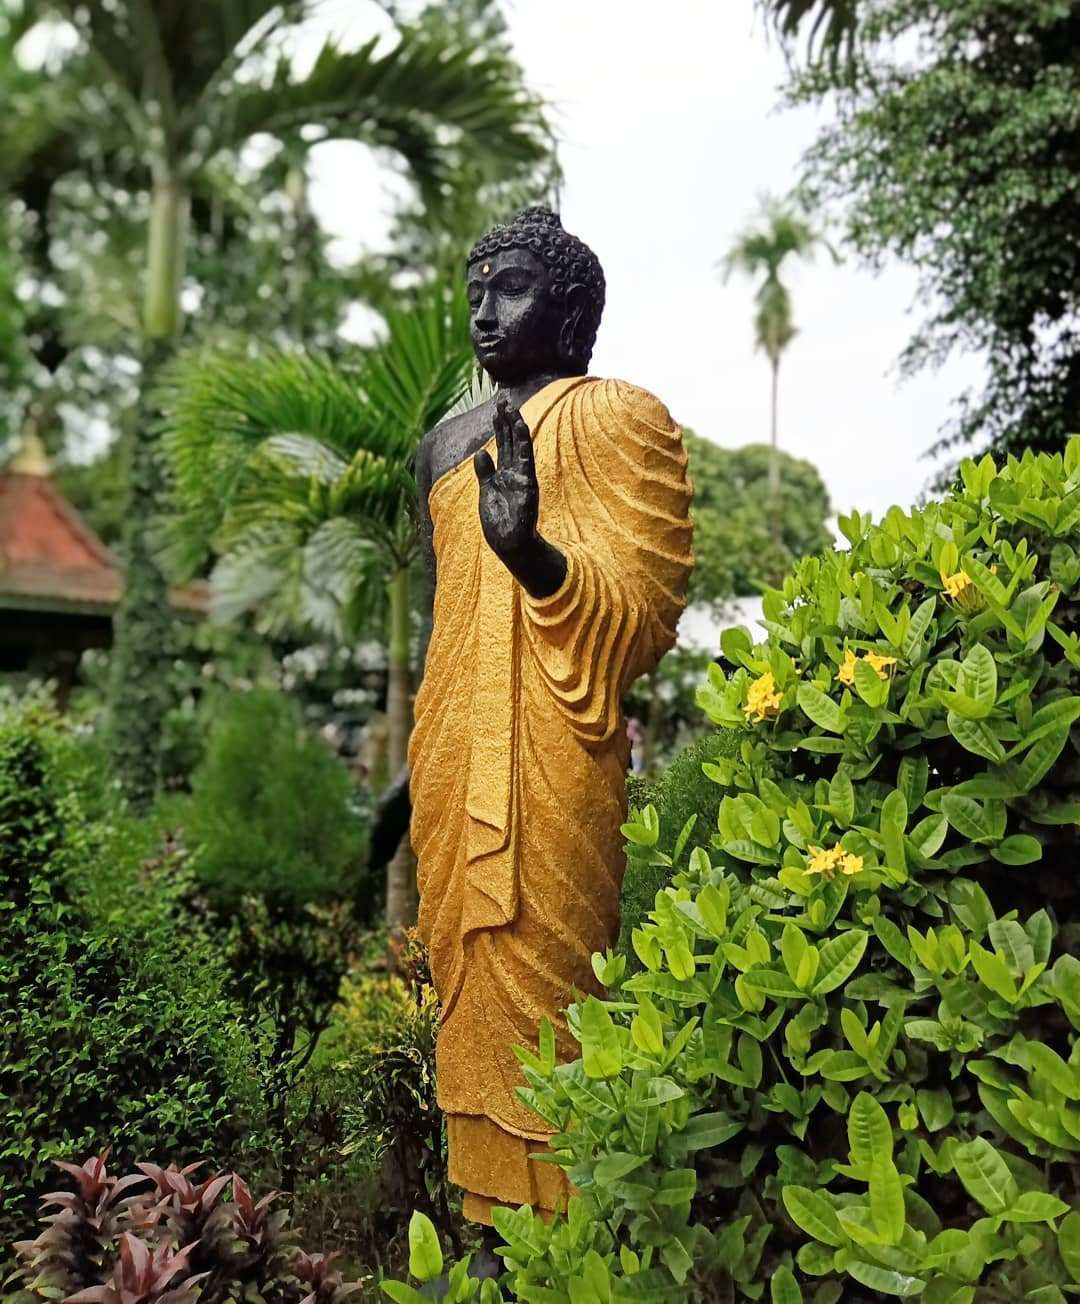 Patung Lainnya Yang ada Disekitar wisata Maha Vihara Mojopahit, Image From @indraarifajari